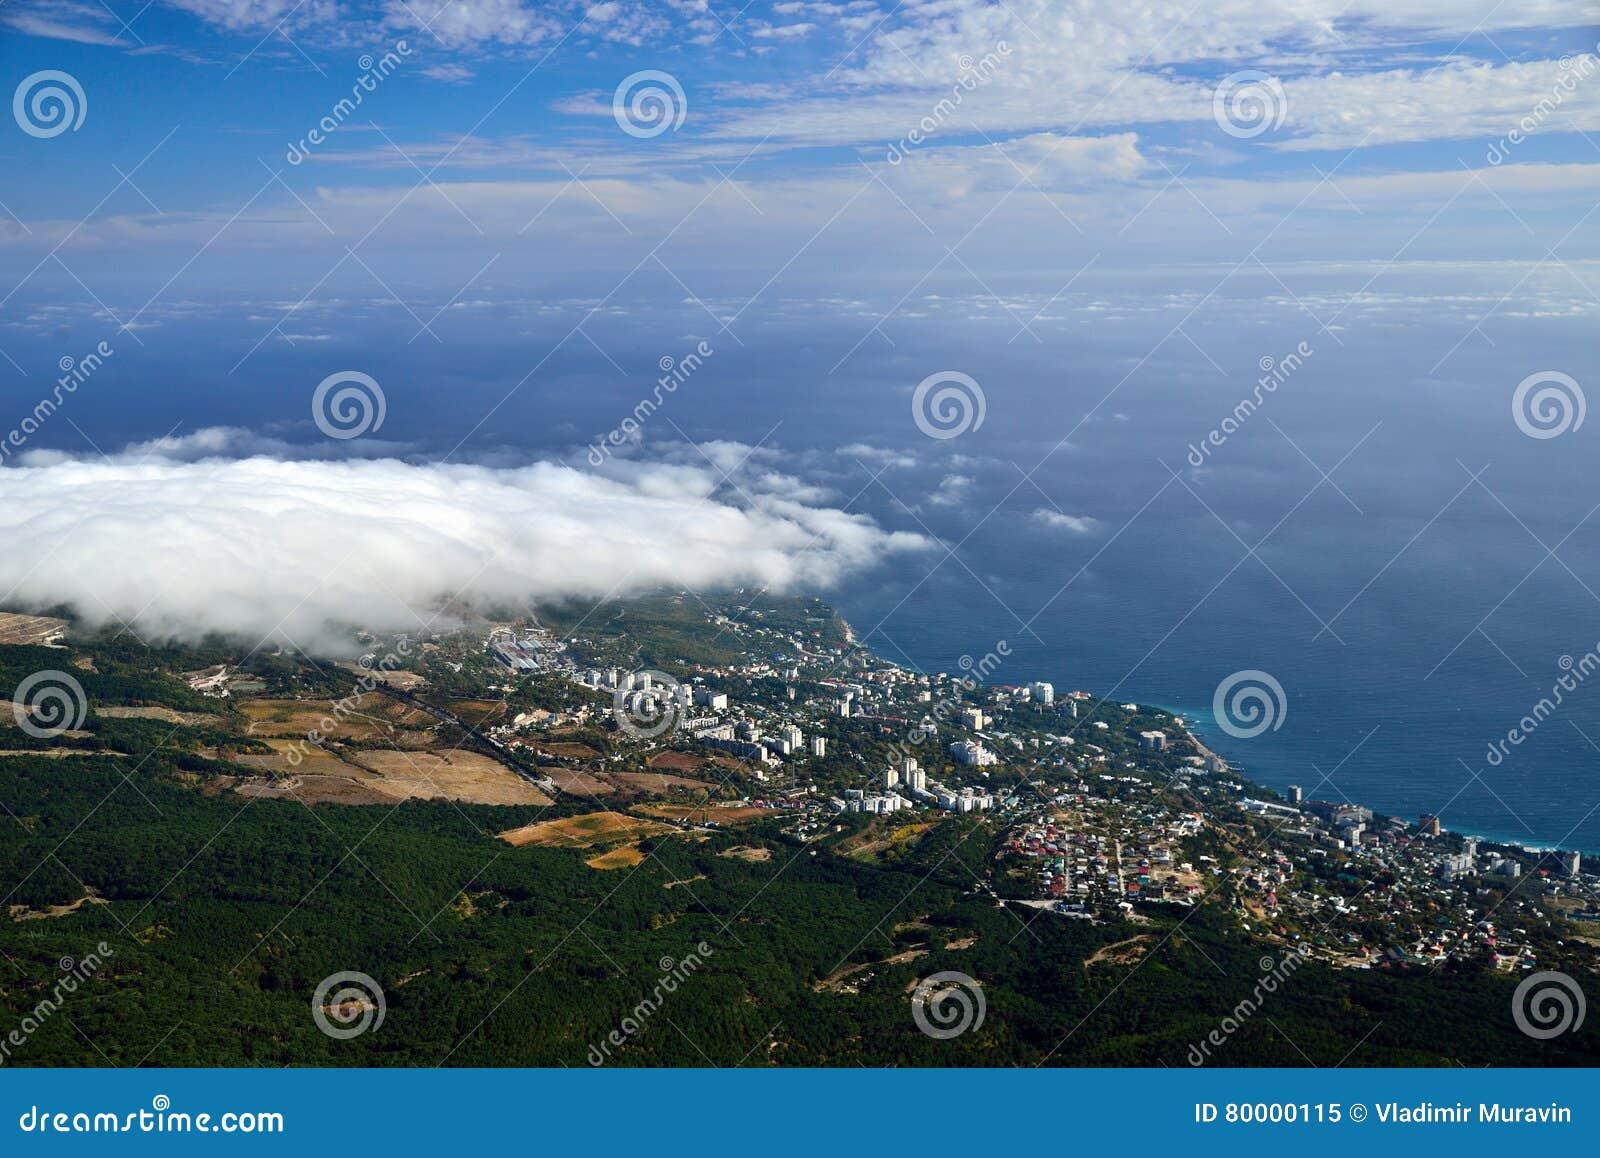 Vue de la primevère farineuse sur la petite ville de bord de la mer